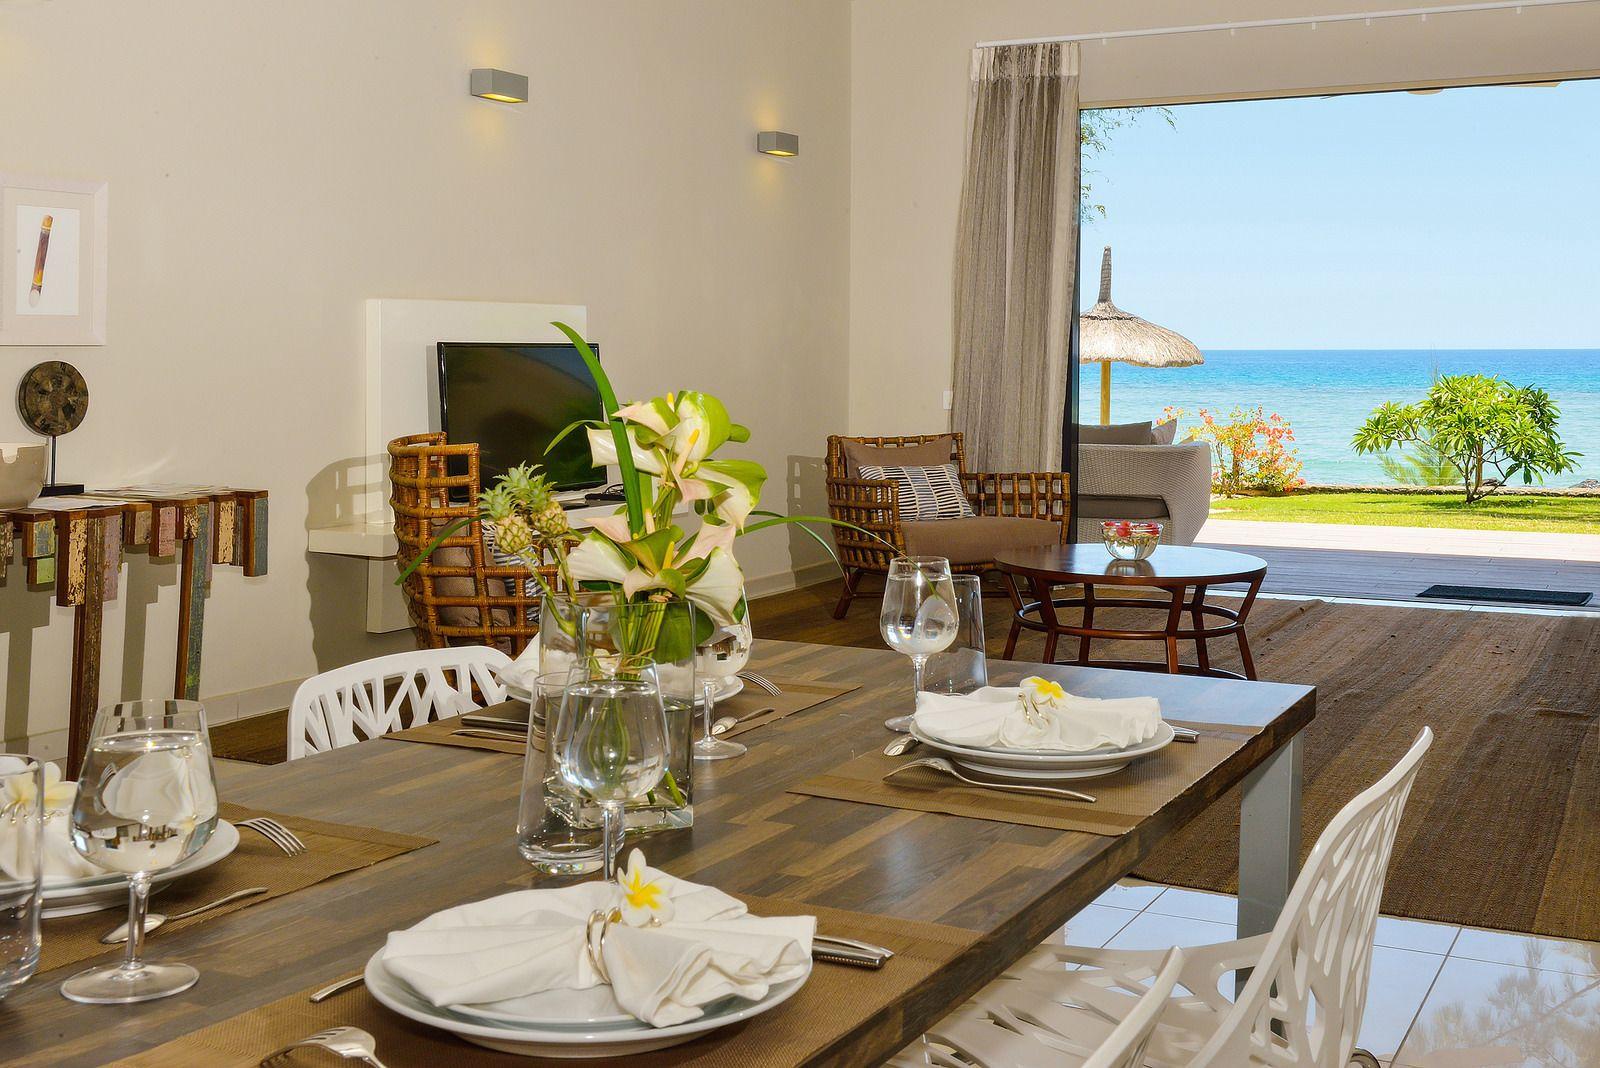 Belle Crique Private Resort